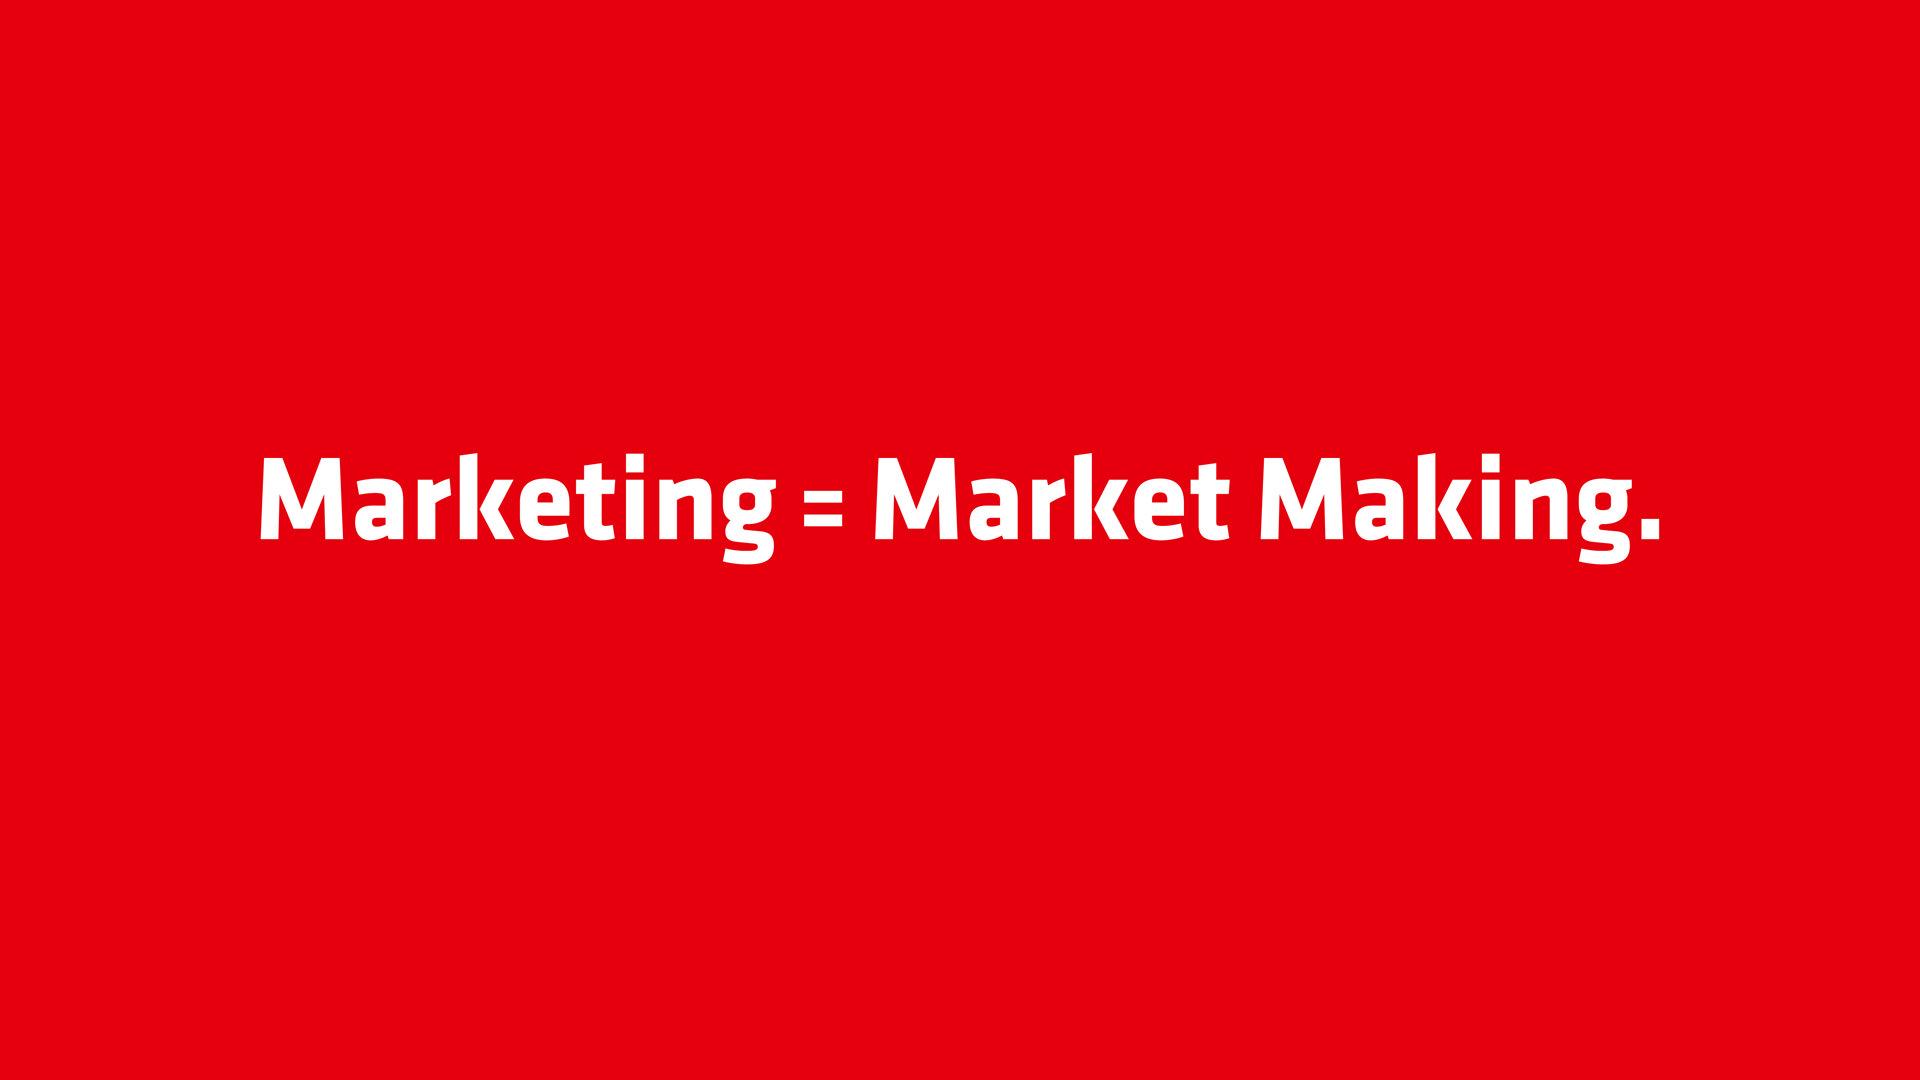 Marketing = Market Making